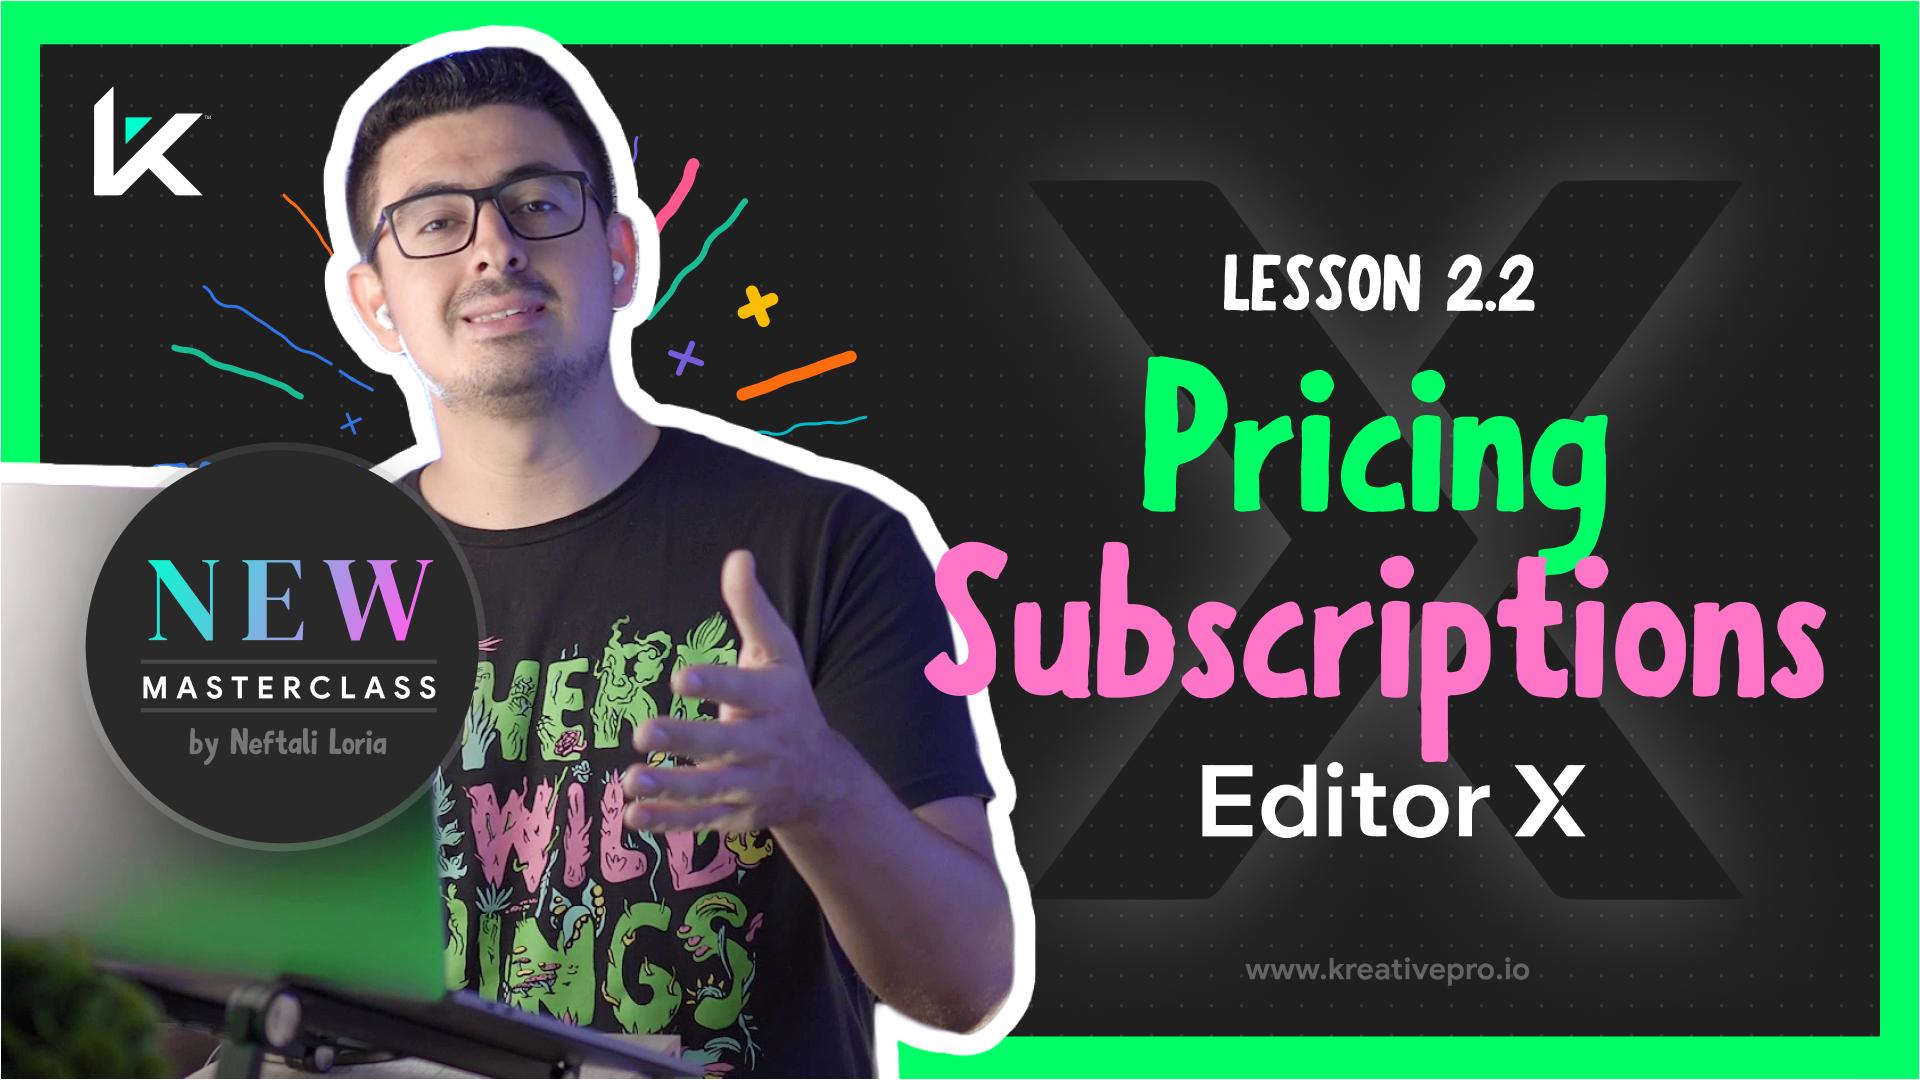 Editor X 2.2 - Editor X Pricing Plans